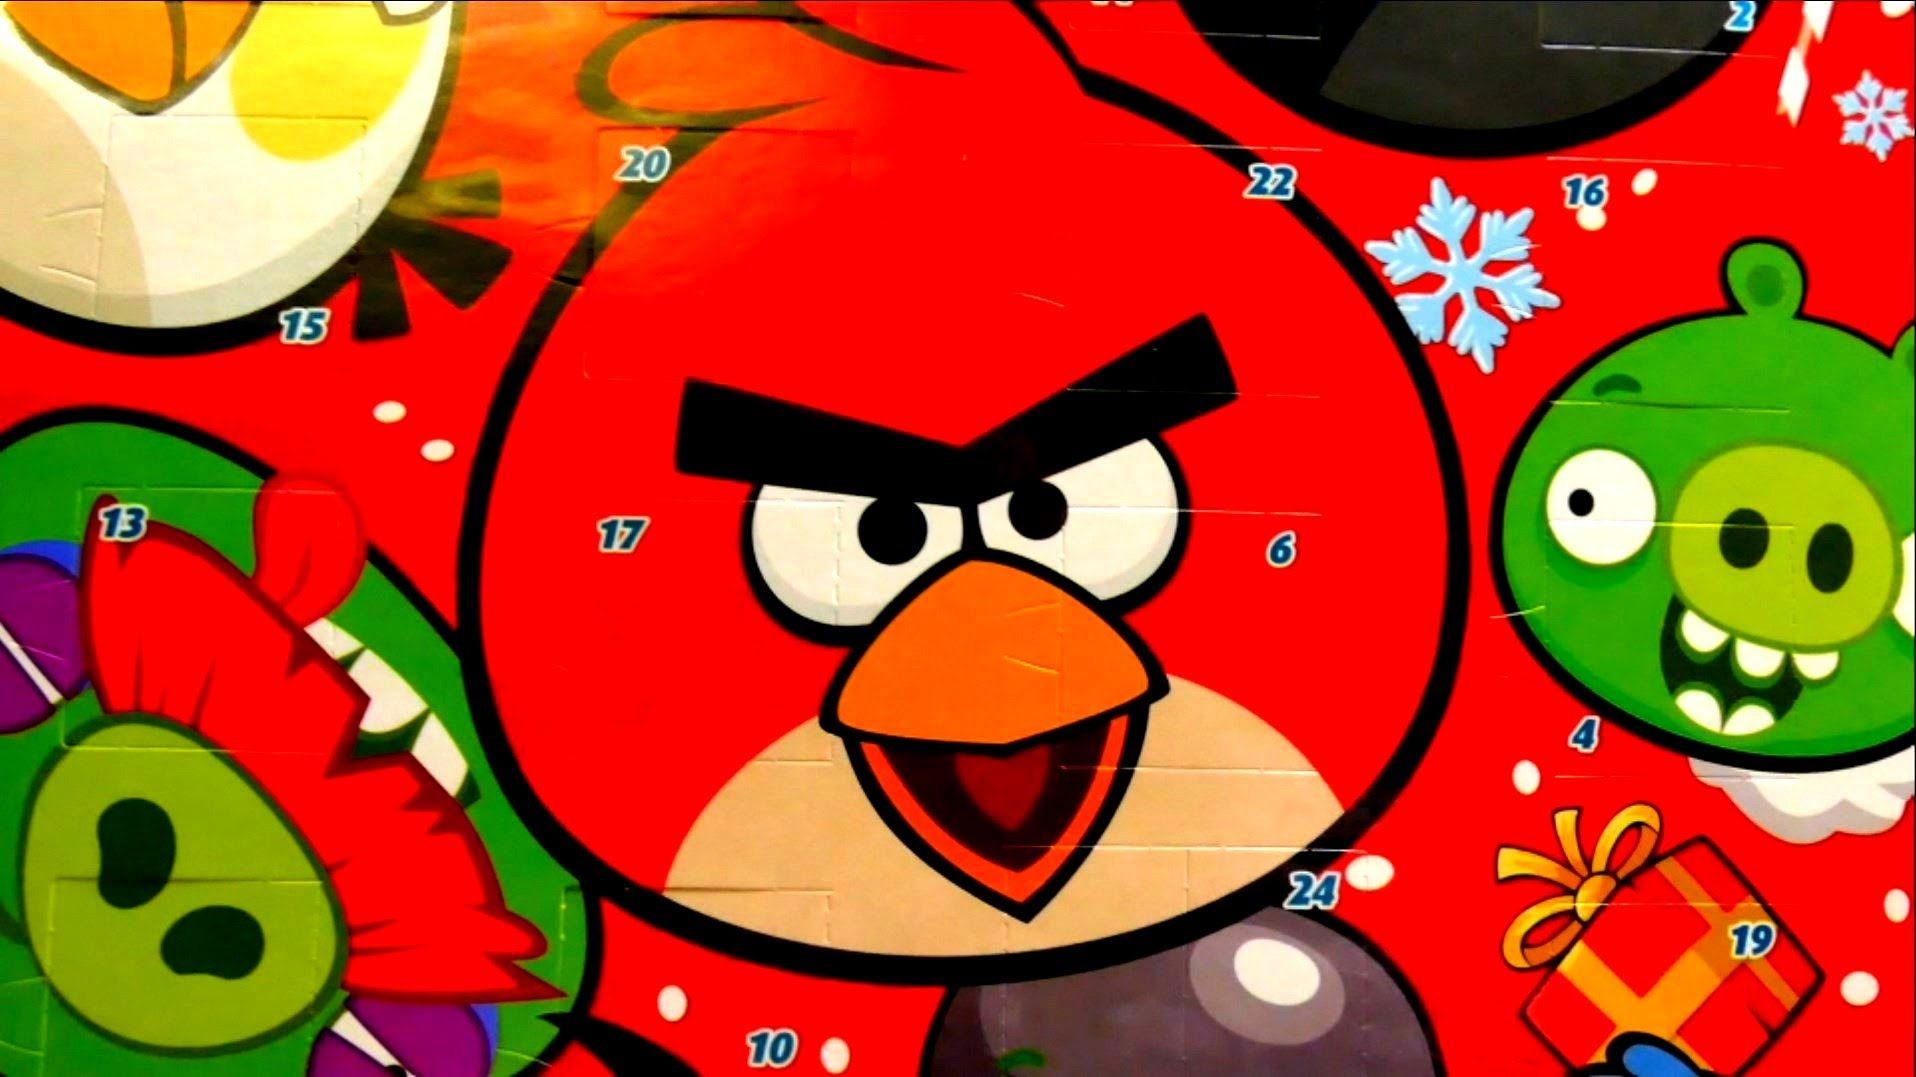 Advent Calendar with Chocolate Angry Birds Angry birds